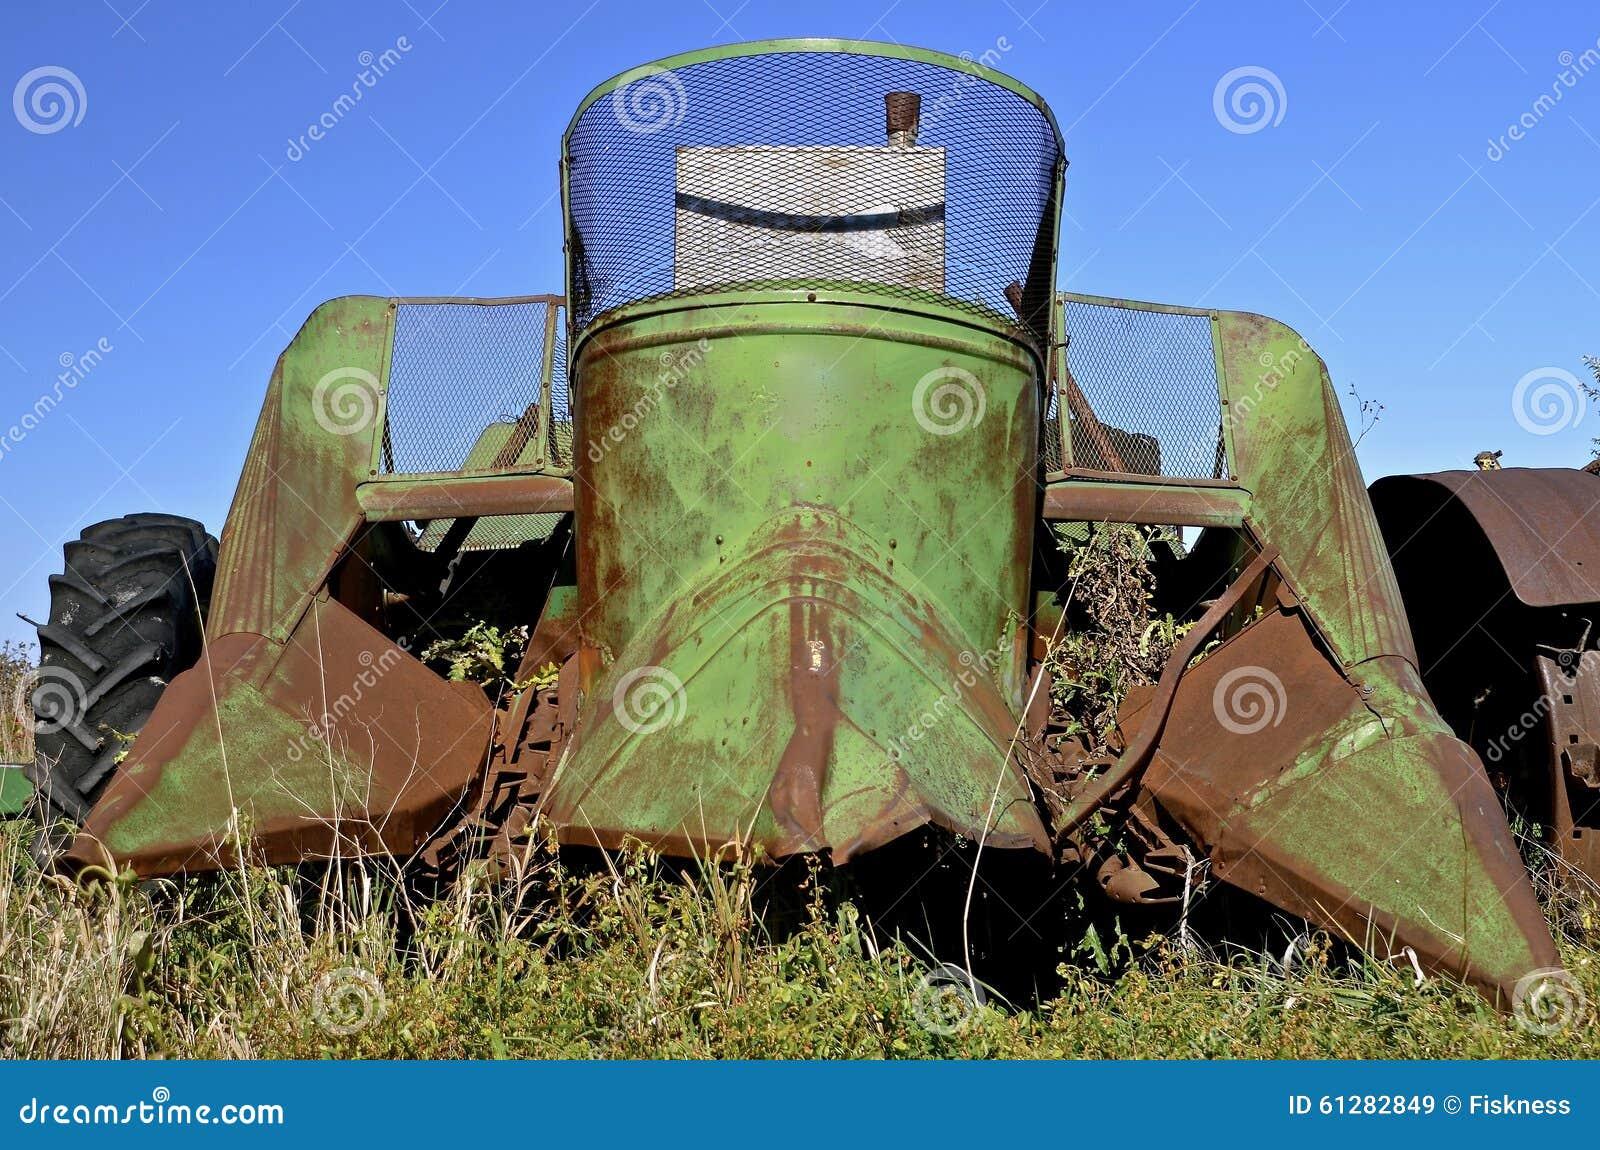 Cartoon Tractor Corn Picker : Farm equipment graveyard royalty free stock image